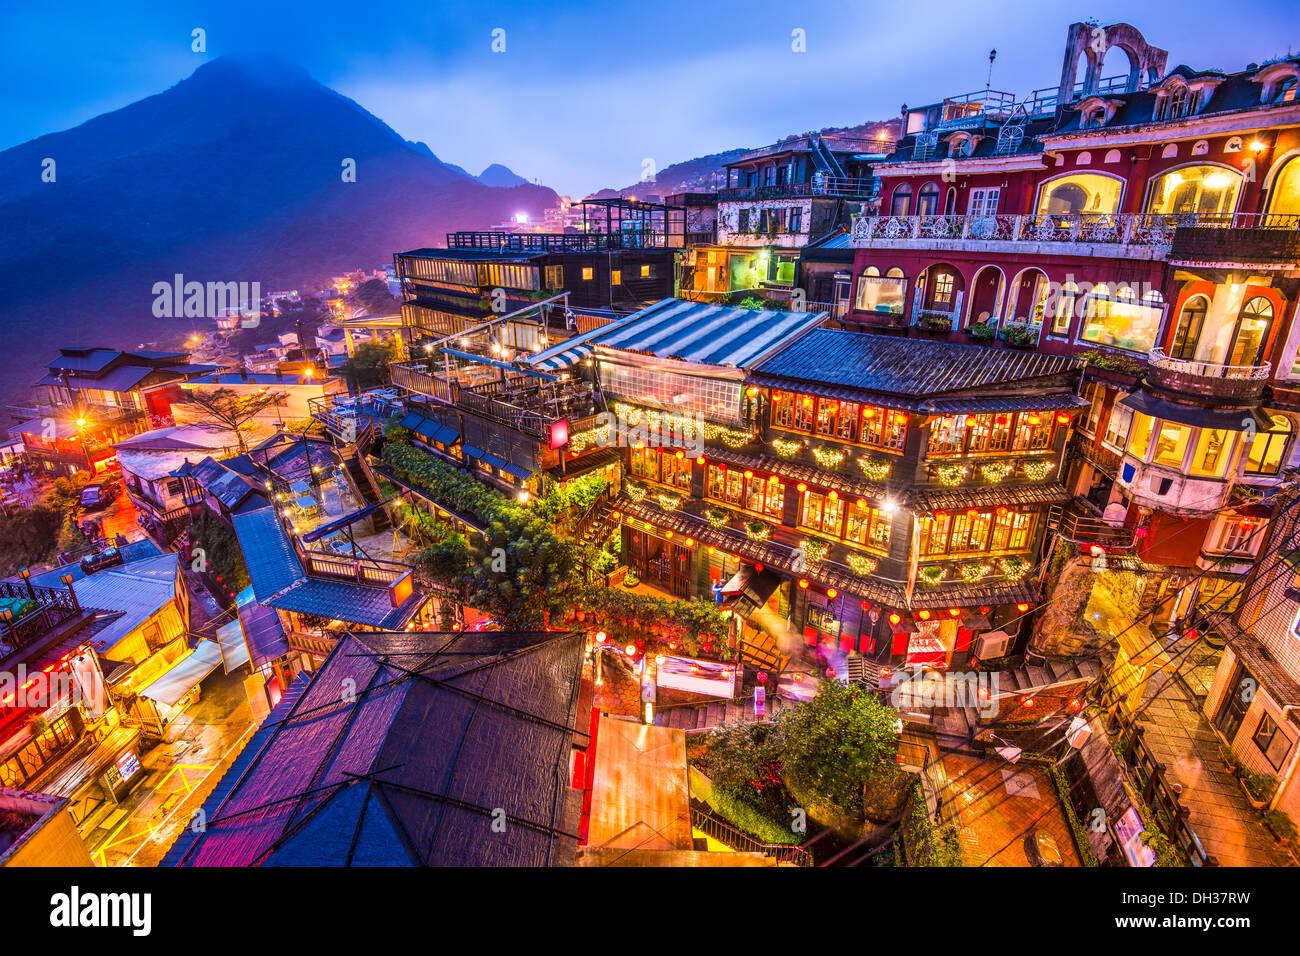 Salones de té de ladera en Jiufen, Taiwán. Imagen De Stock